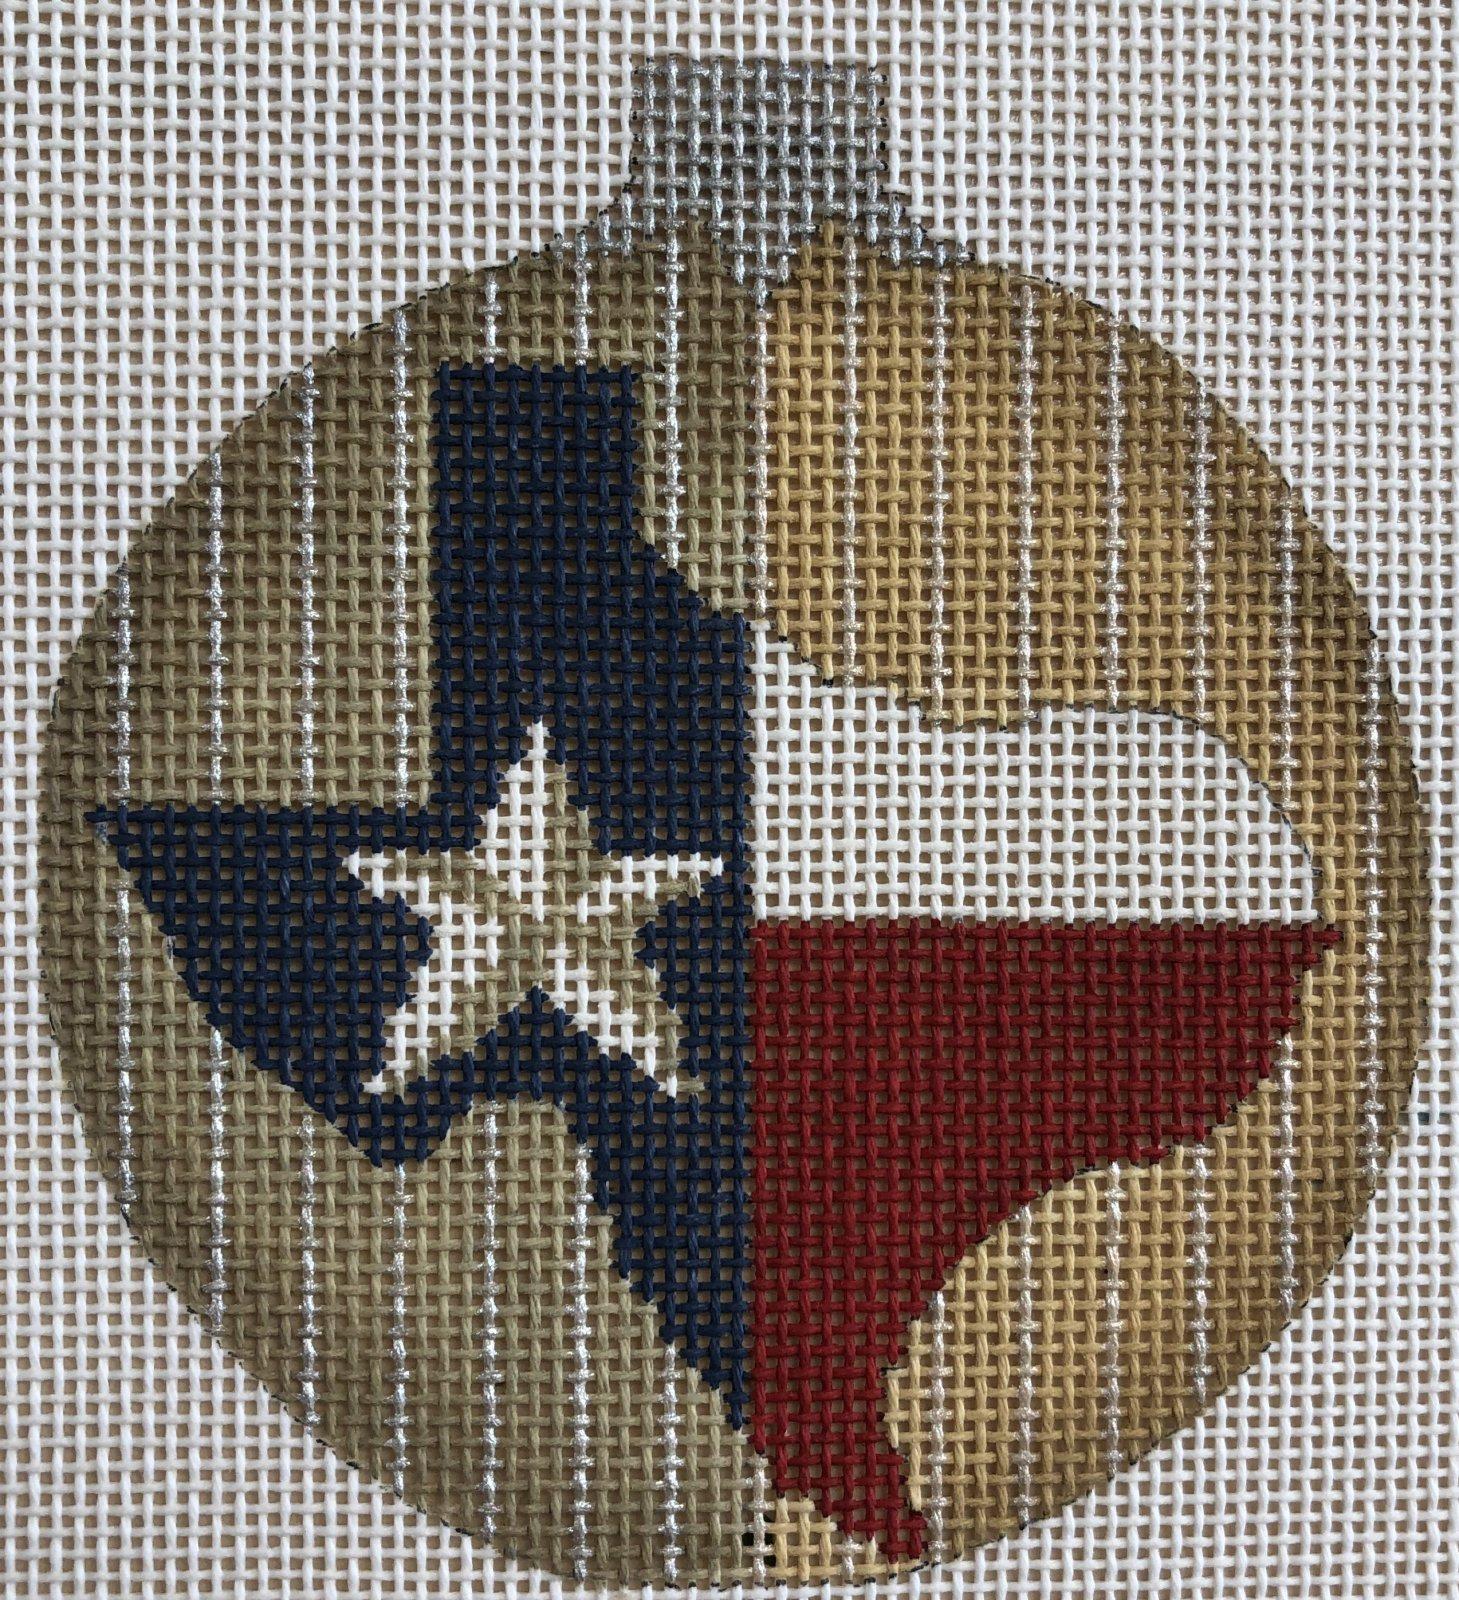 PC-KC State O' Texas Ball Ornament 3.5 Round 18M